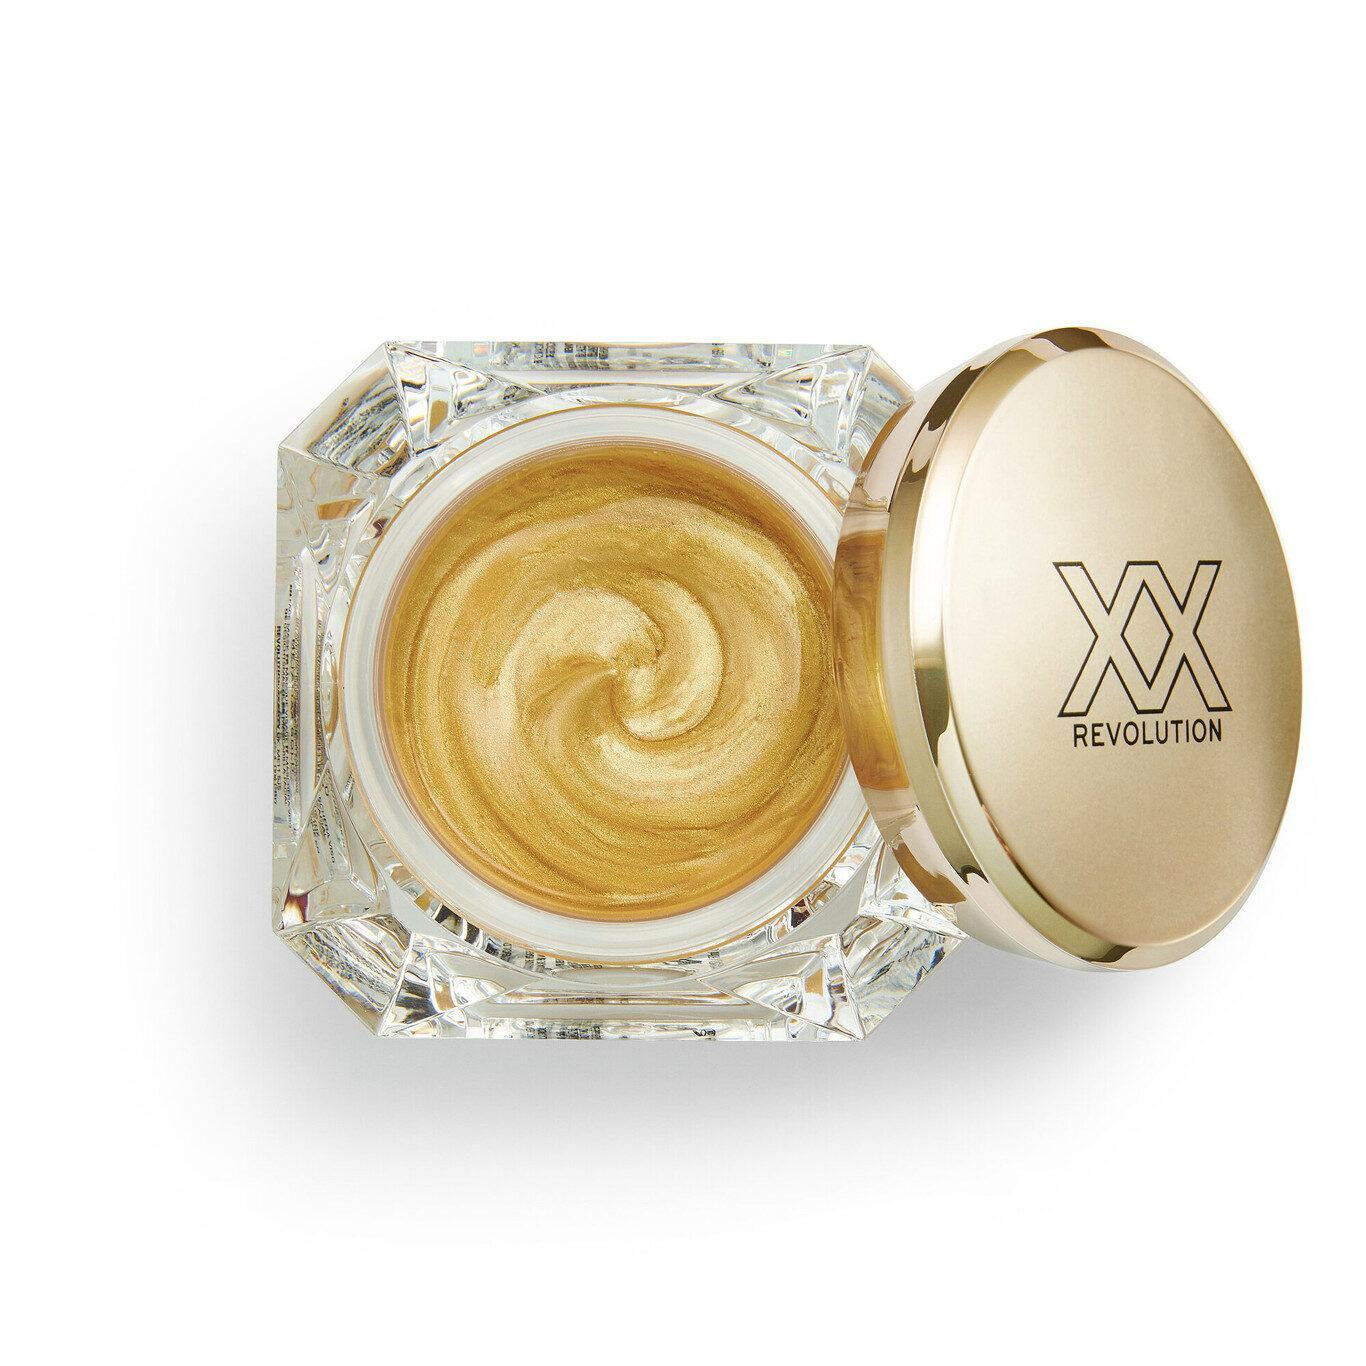 XX Revolution MetaliXX Collection MetaliXX Gold Face Mask Open